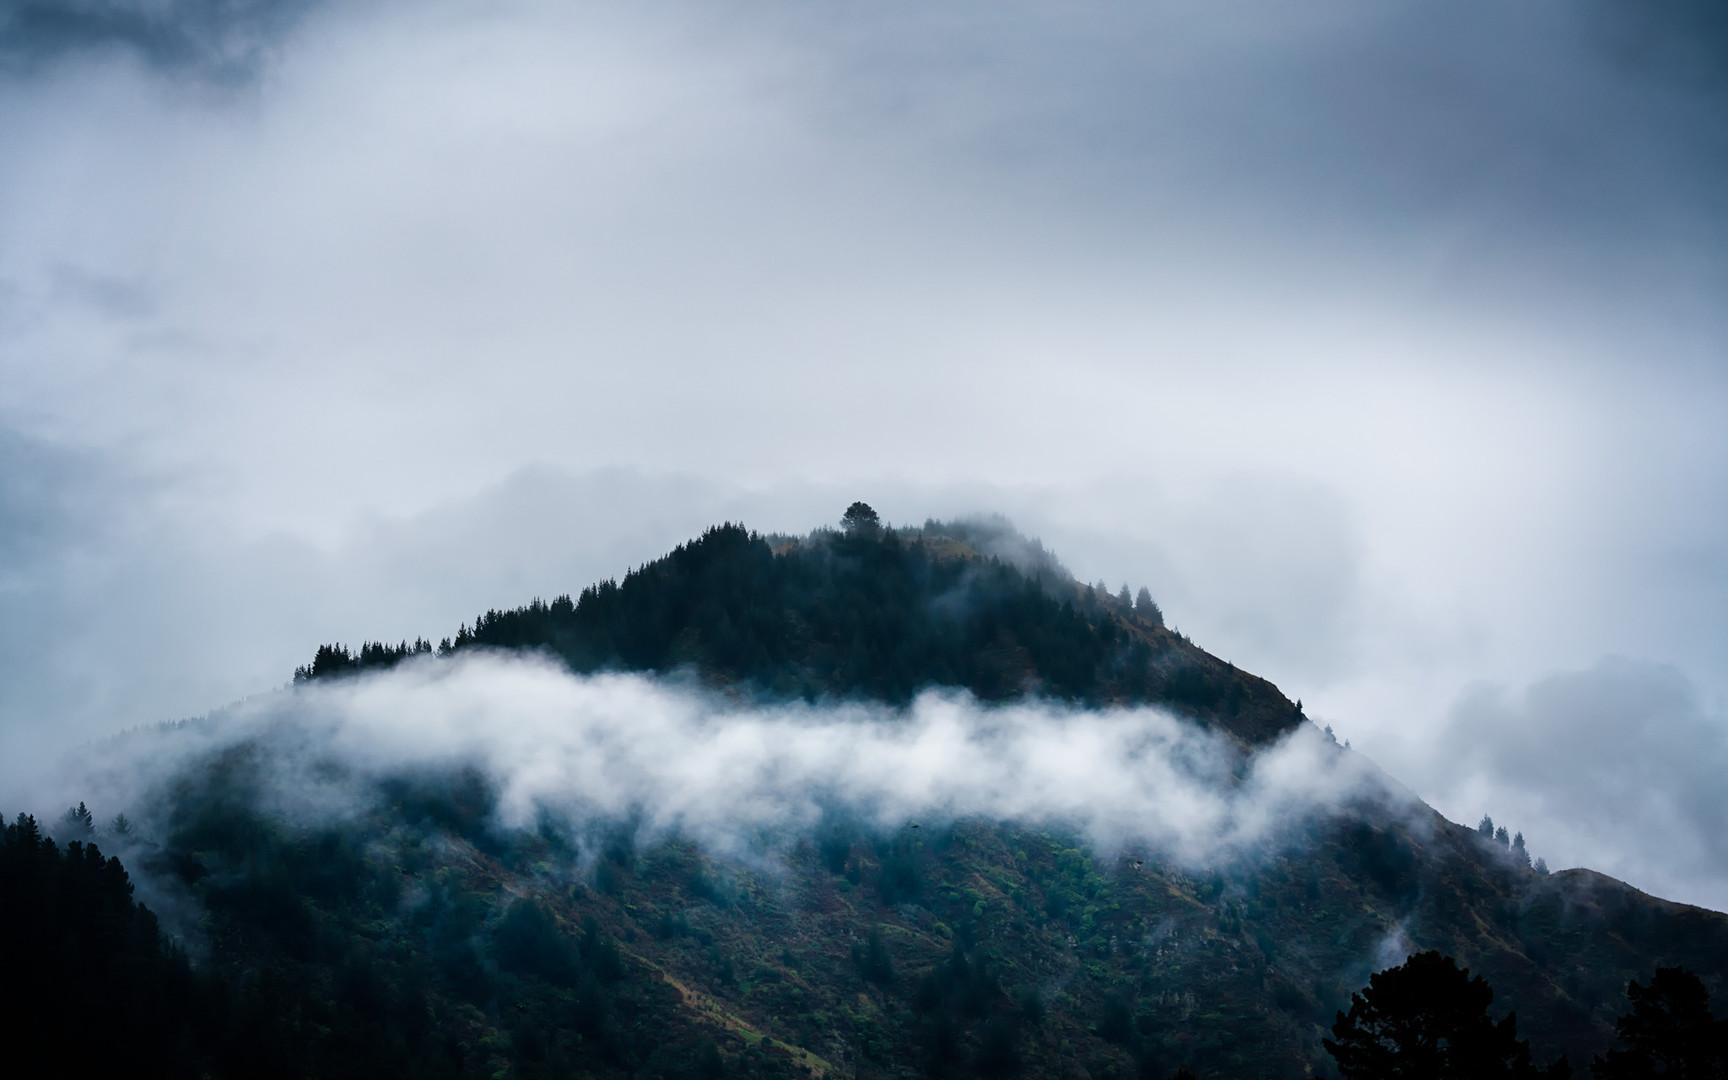 nz-new-Zealand-southisland-fog.jpg